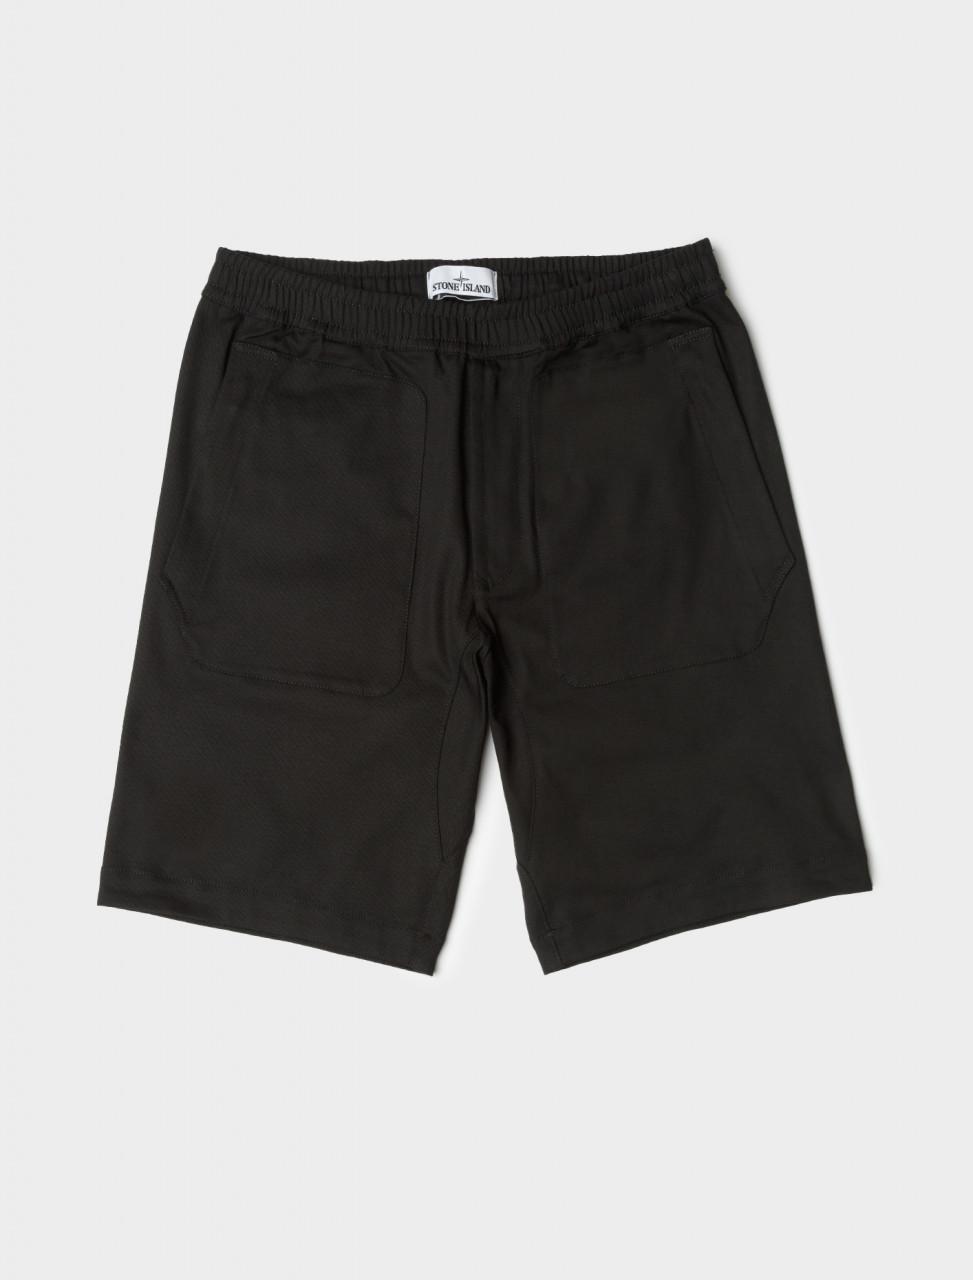 Cotton Blend Shorts in Black